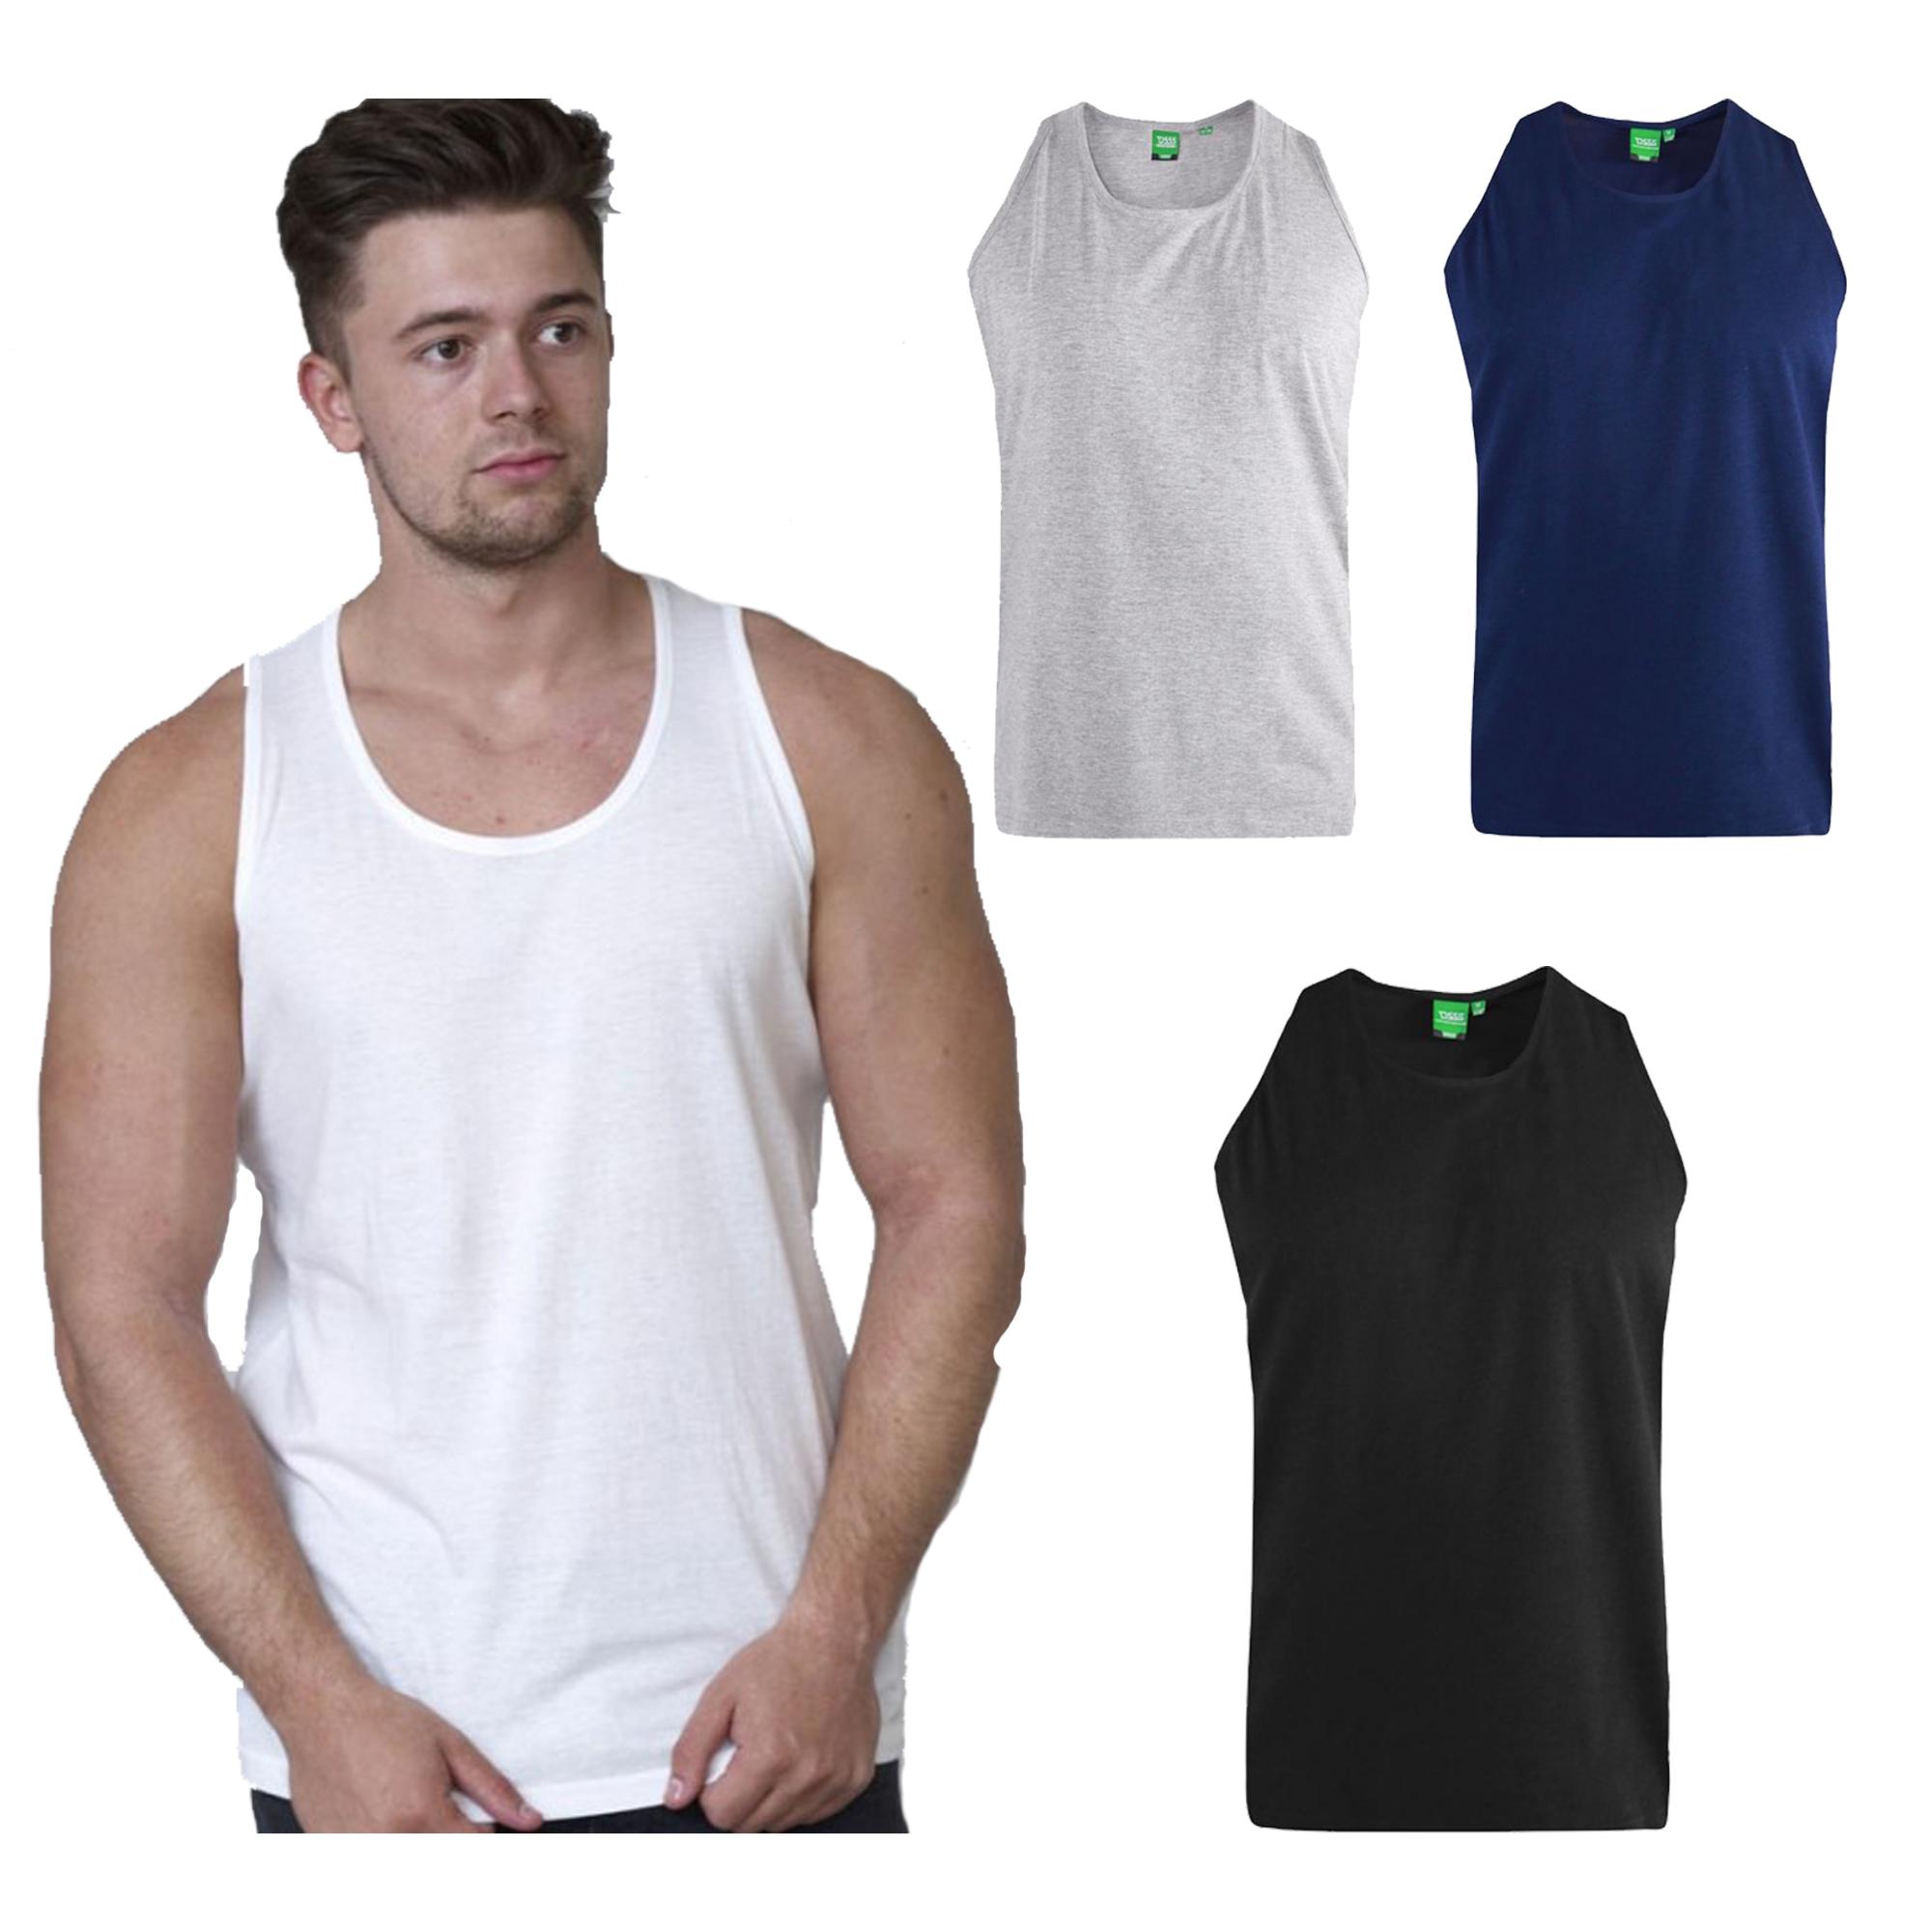 Duke D555 Mens Fabio Vest Large King Size Muscle Sleeveless Shirt Tee Tank Top